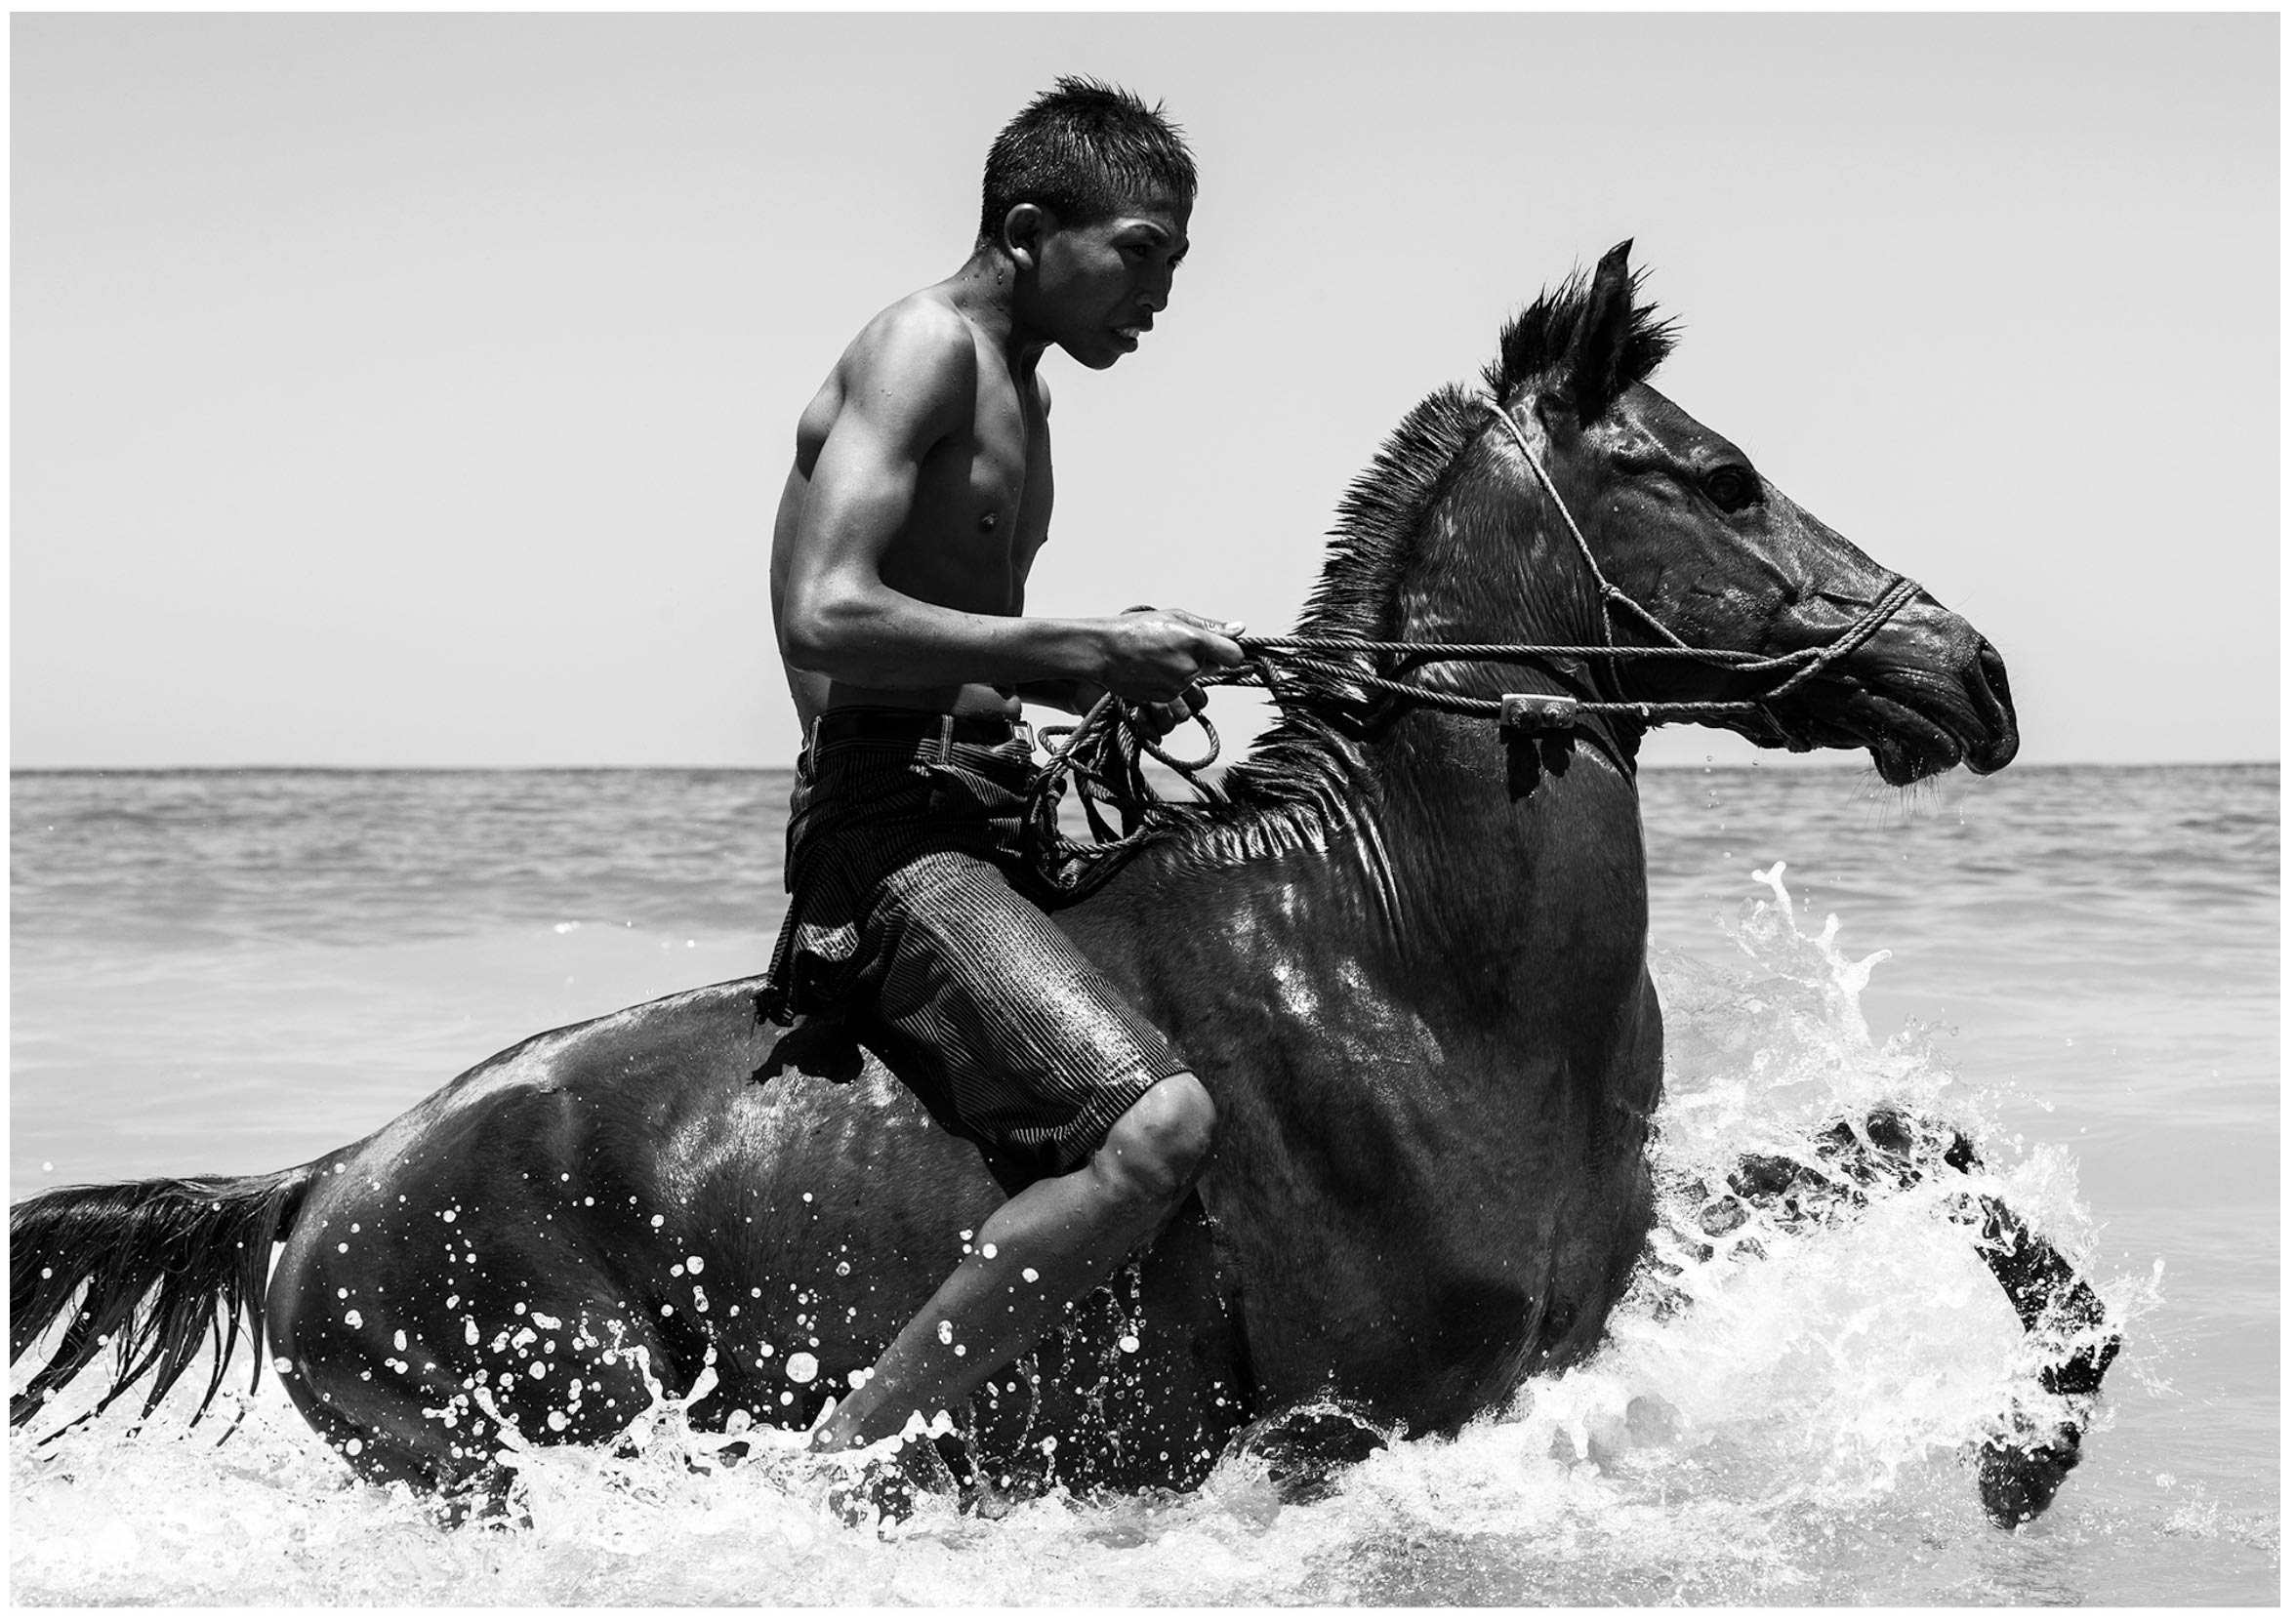 rodd-owen-ocean-surf-photography-artworks-for-sale-005.jpg